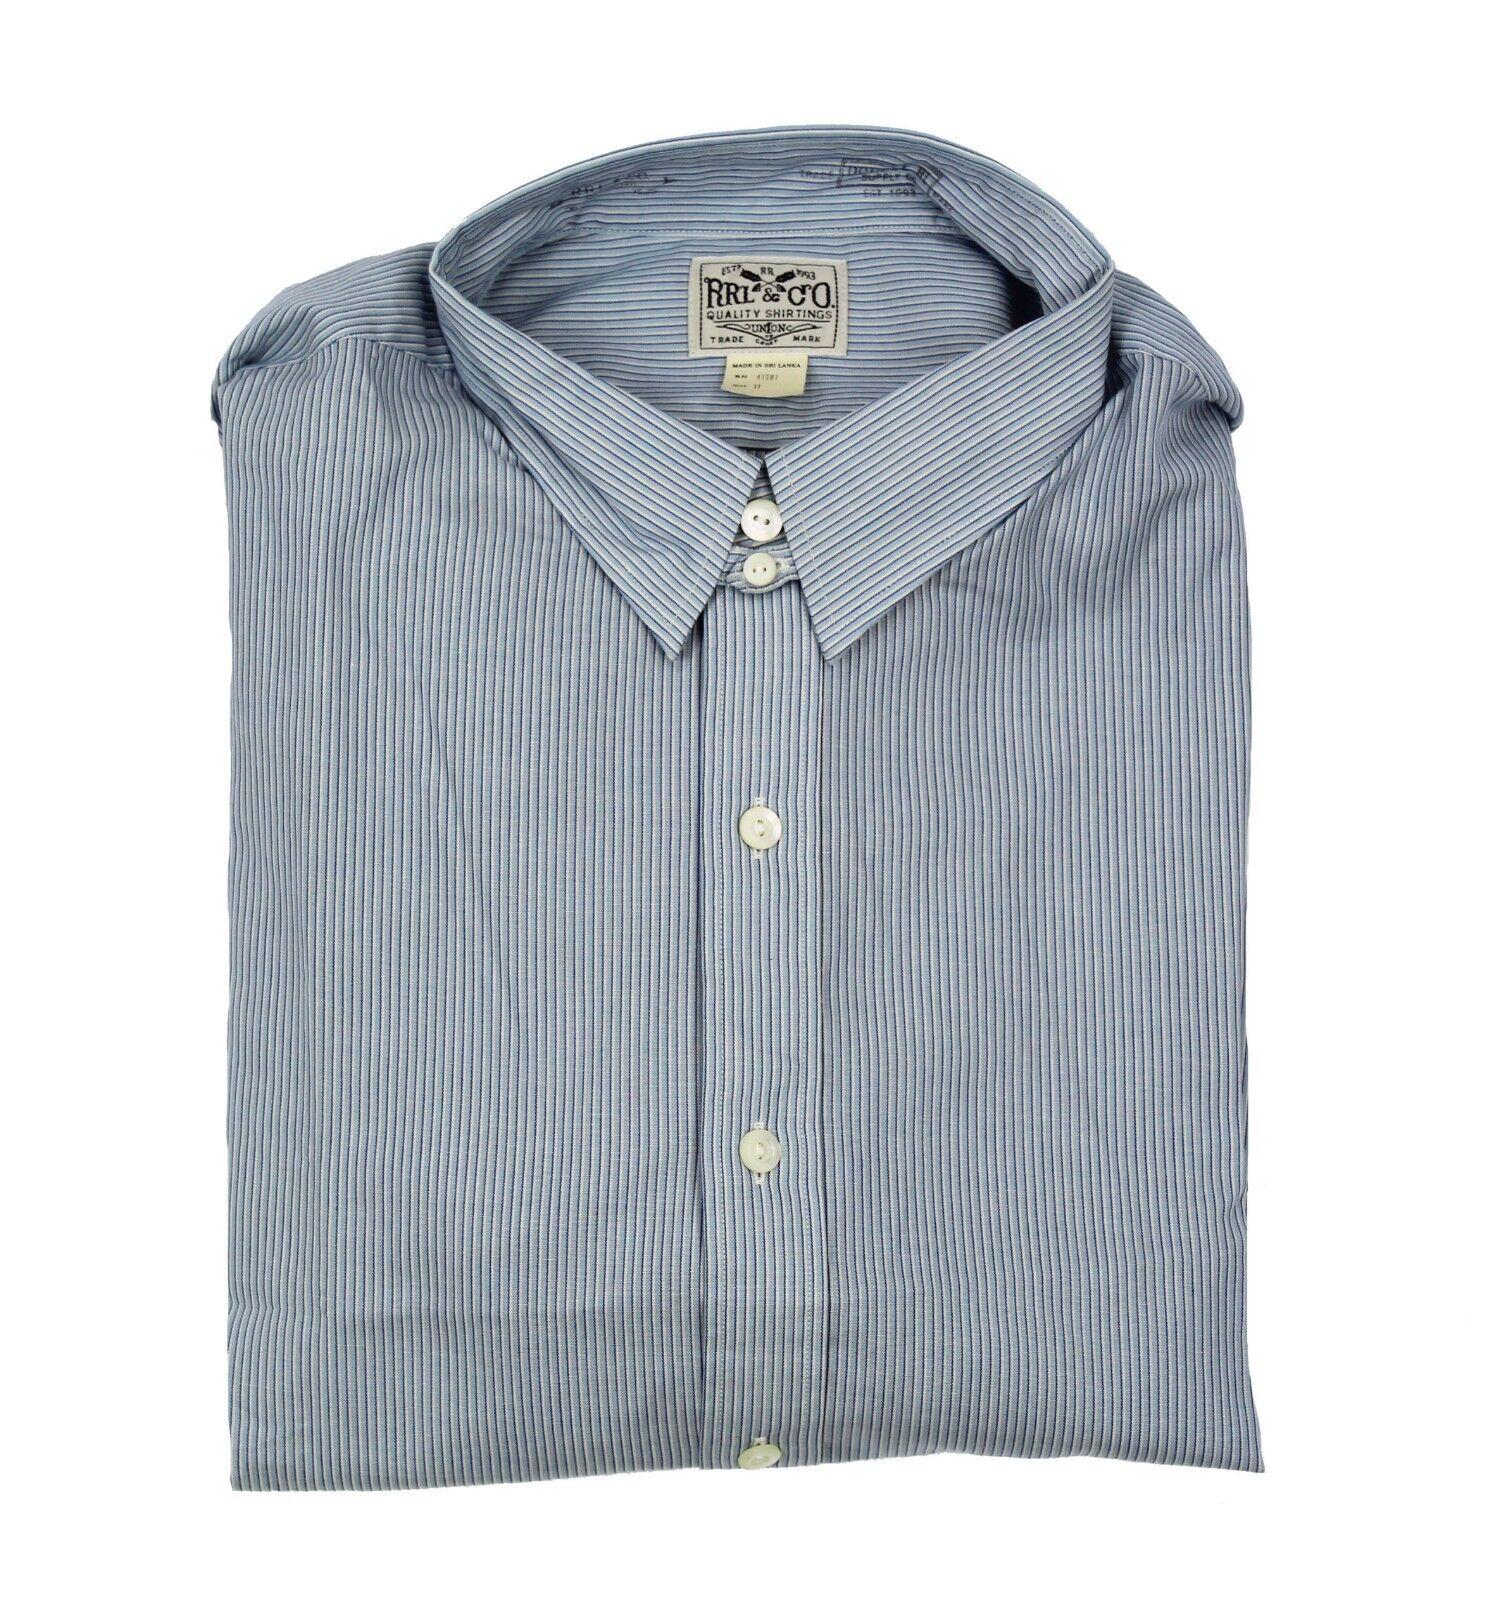 245 Double Ralph Lauren  Herren RRL Button Down Blau Striped Eli Dress Shirt NWT